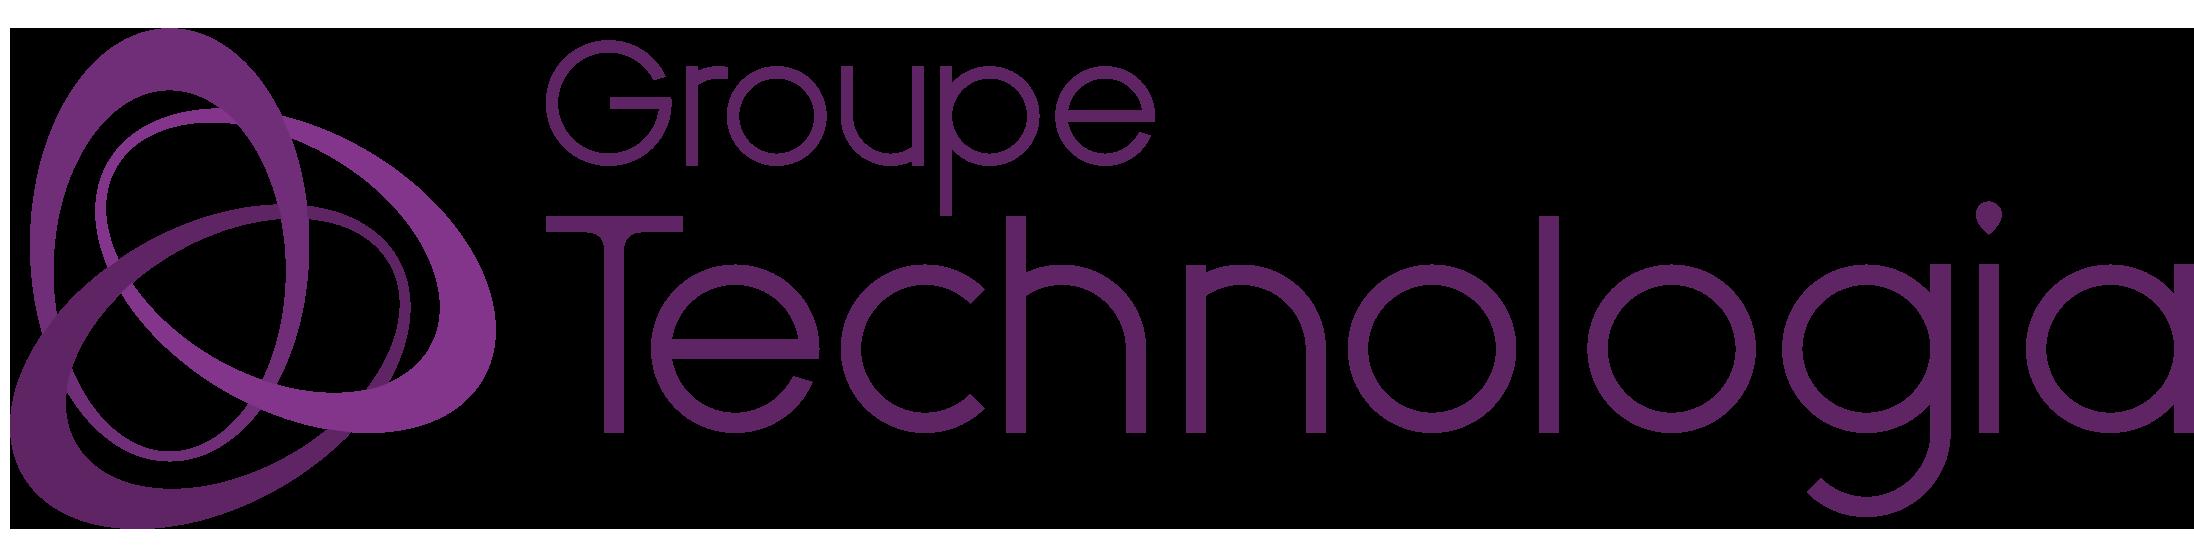 groupe technologia logo